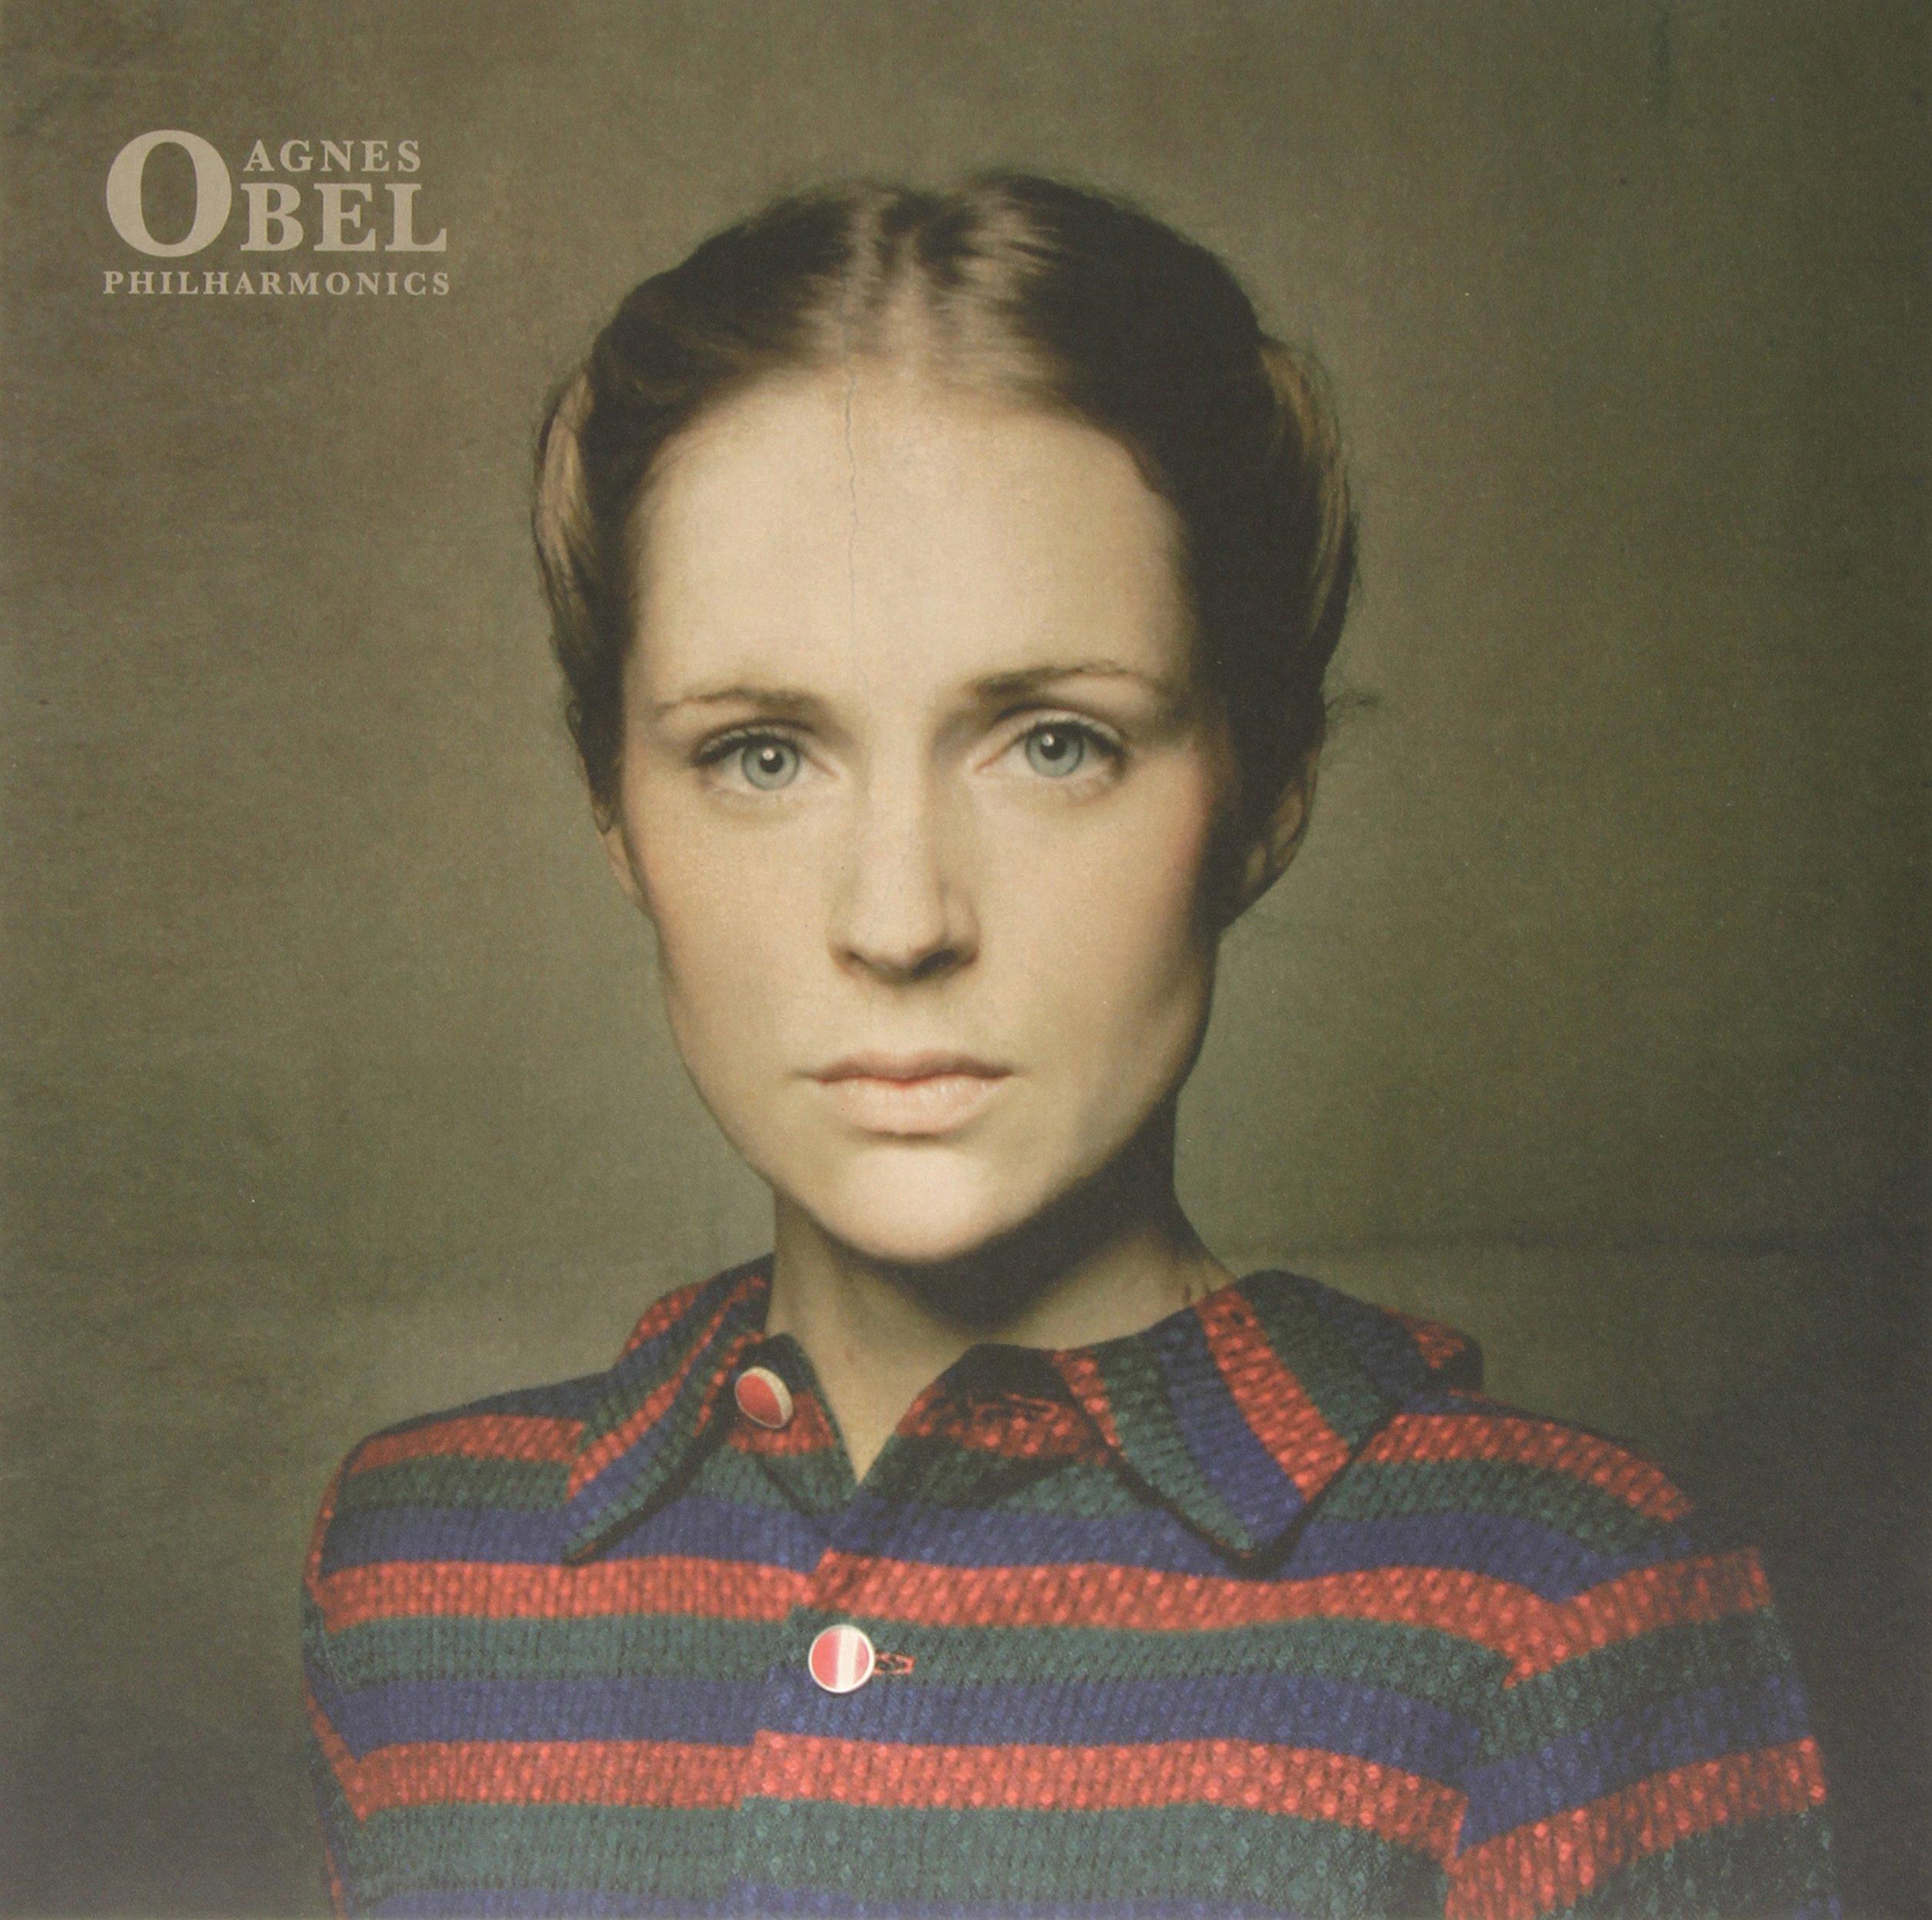 Agnes Obel - Philharmonics (LP Vinyl)